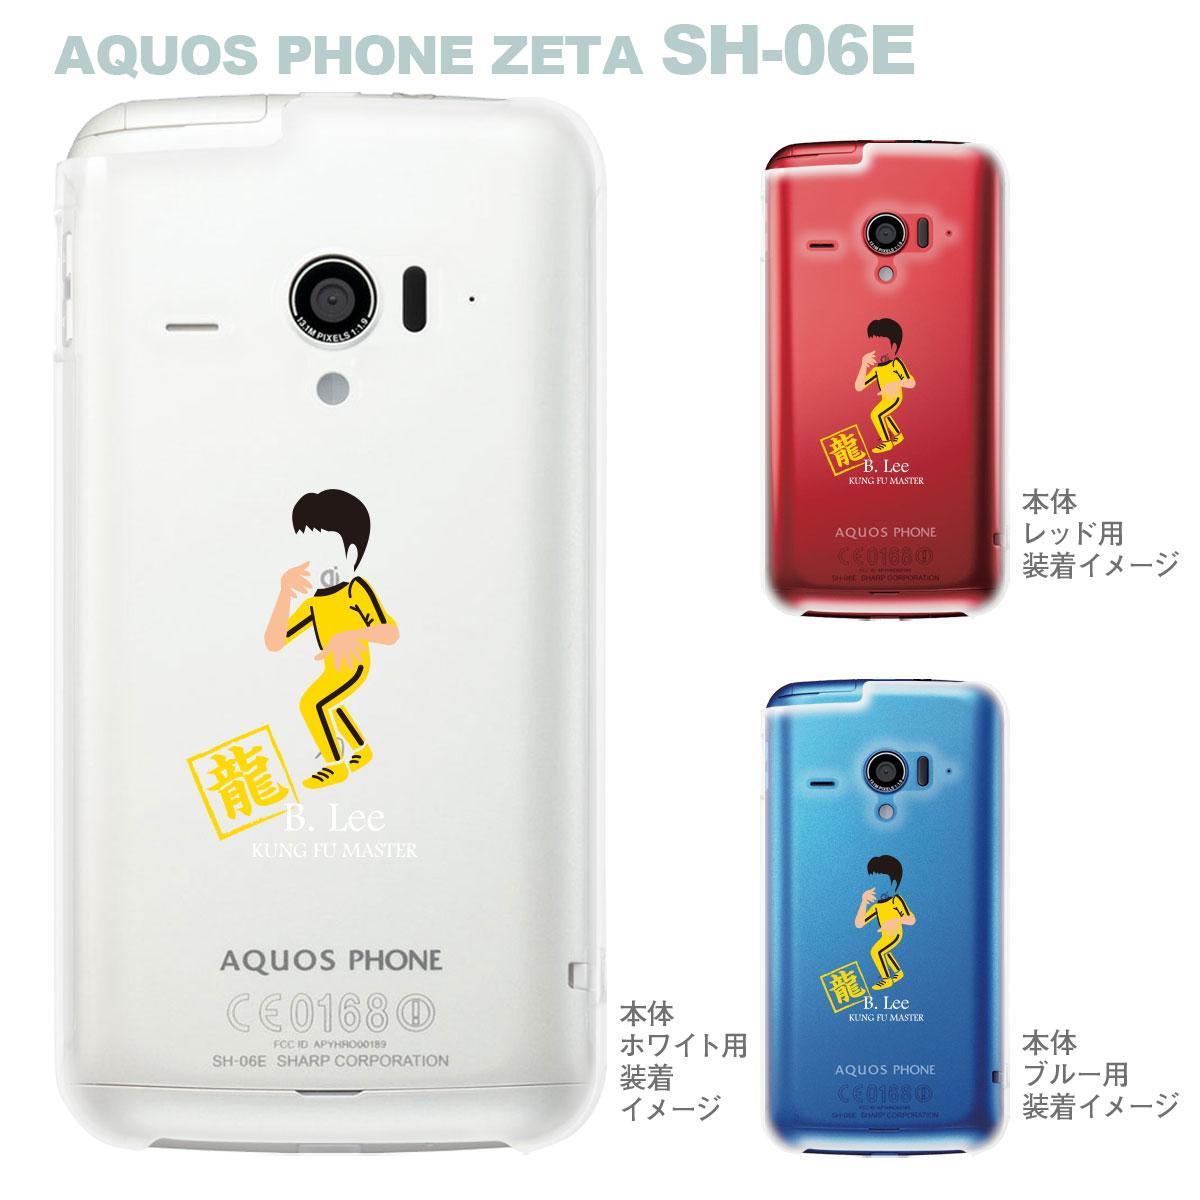 【AQUOS PHONE ZETA SH-06E】【IGZO】【イグゾー】【ケース】【カバー】【スマホケース】【クリアケース】【クリアーアーツ】【ユニーク】【MOVIE PARODY】【カンフー】 10-sh06e-ca0026